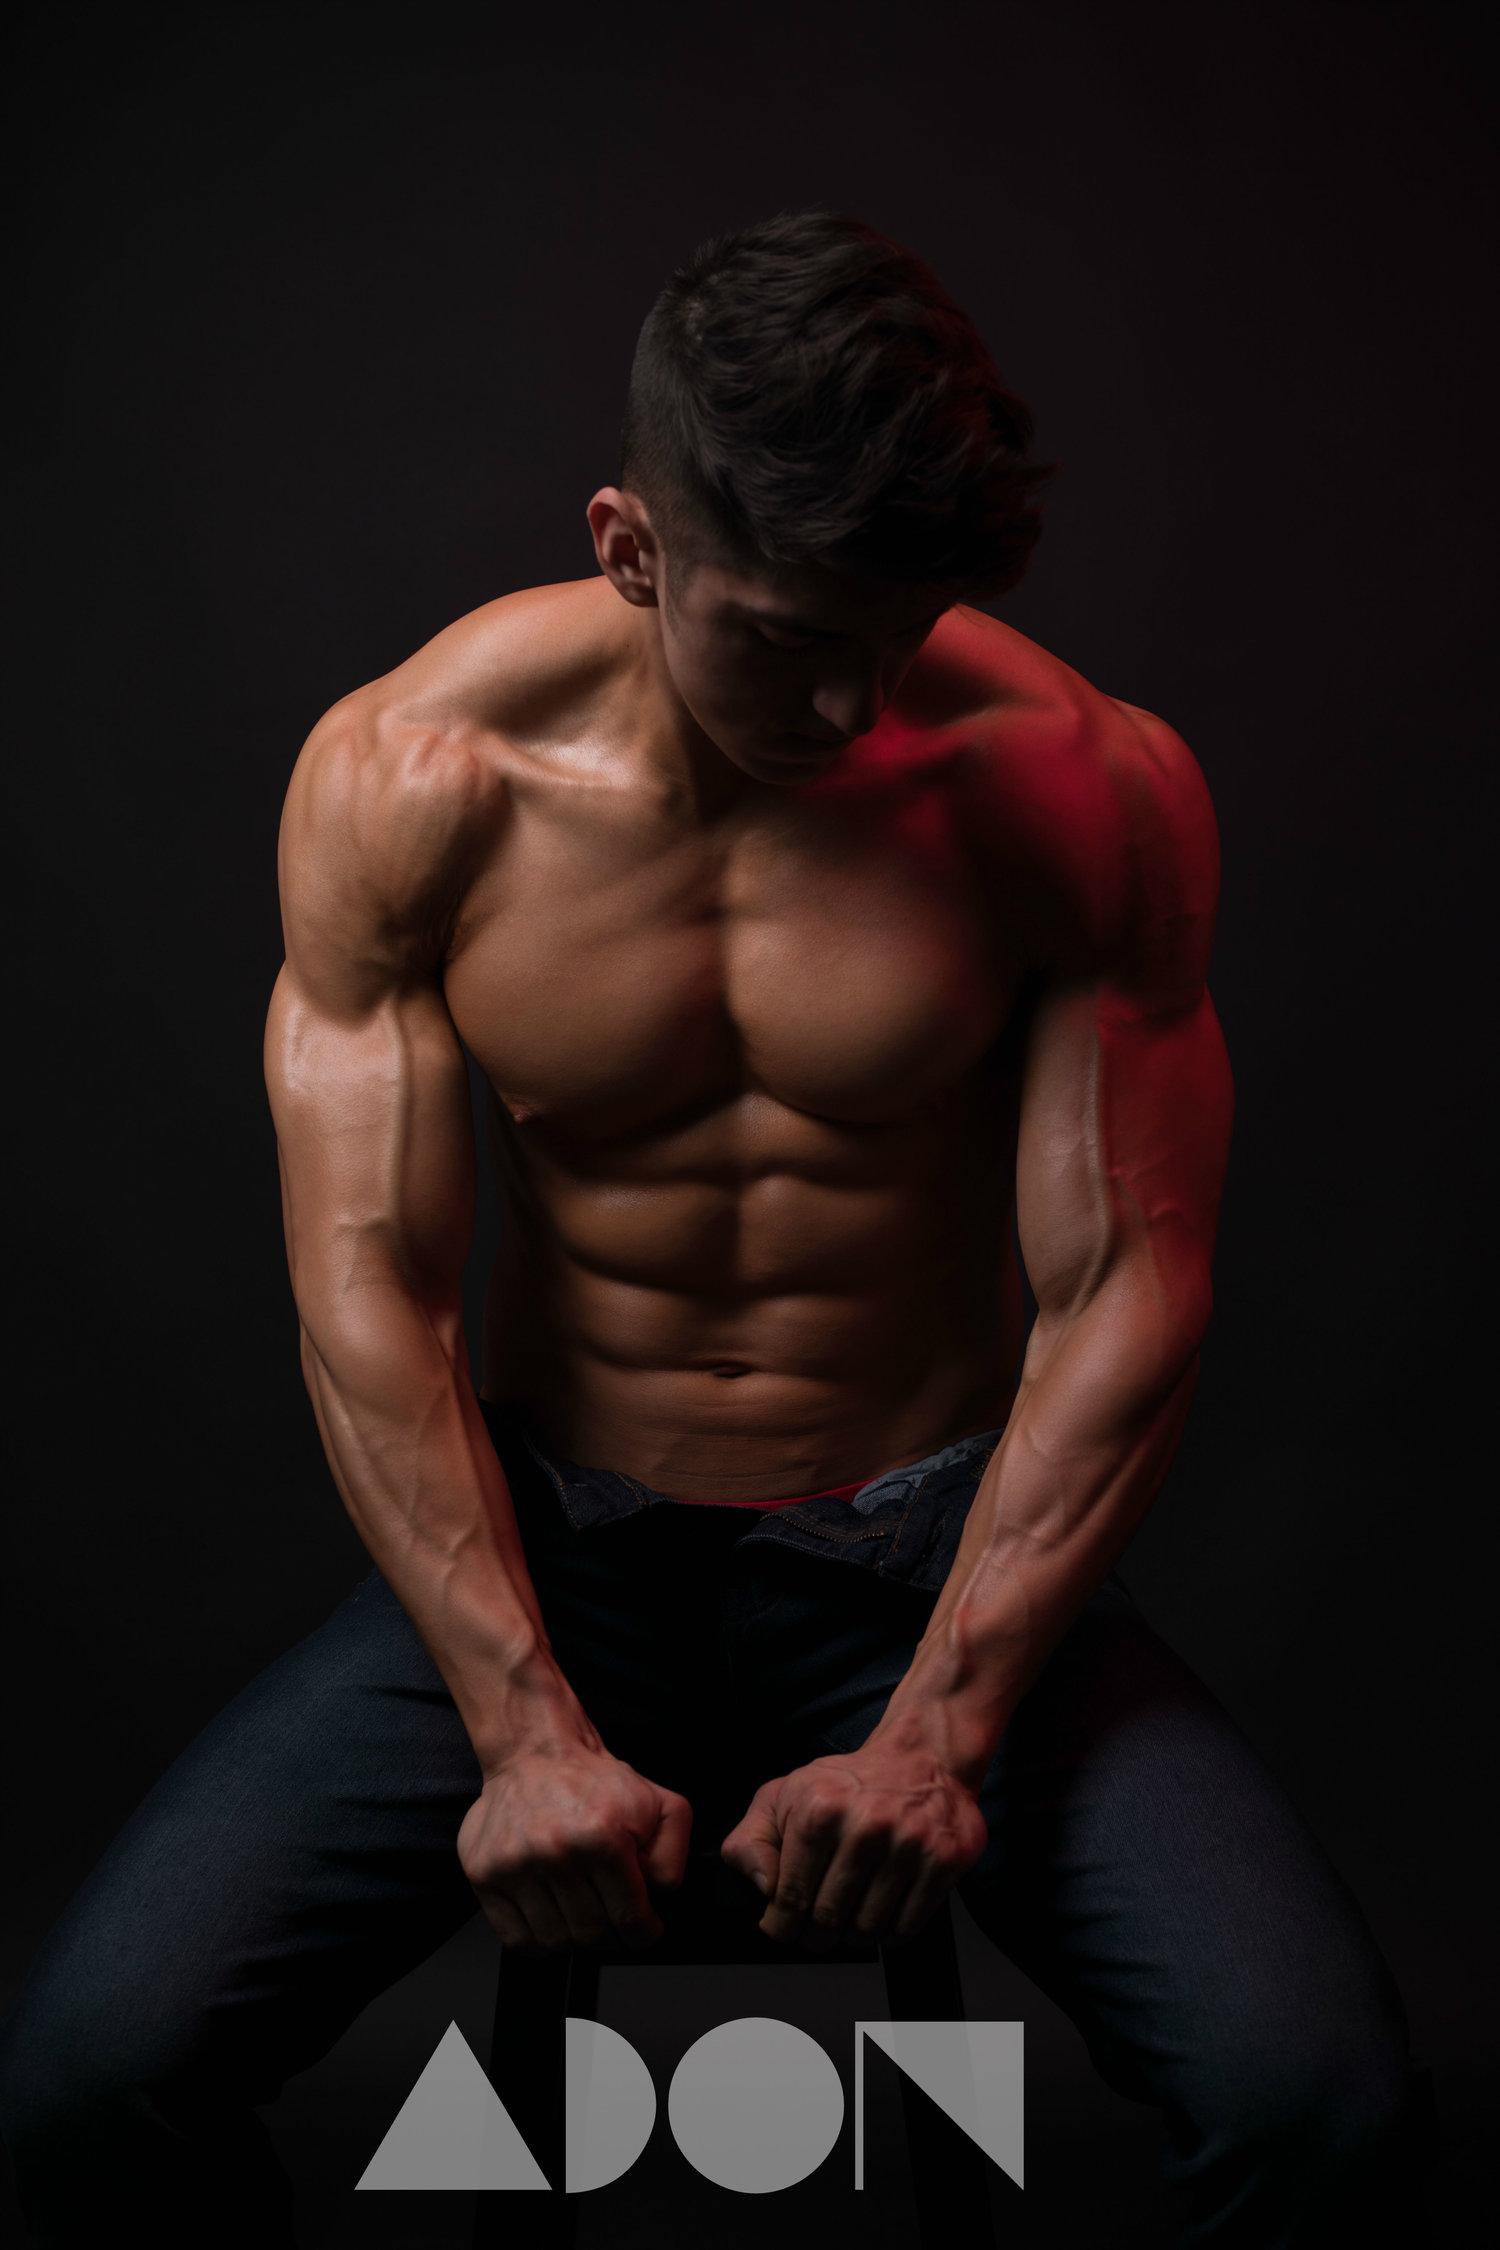 Adon Exclusive: Model Diego Gonzalez By Brian Huey